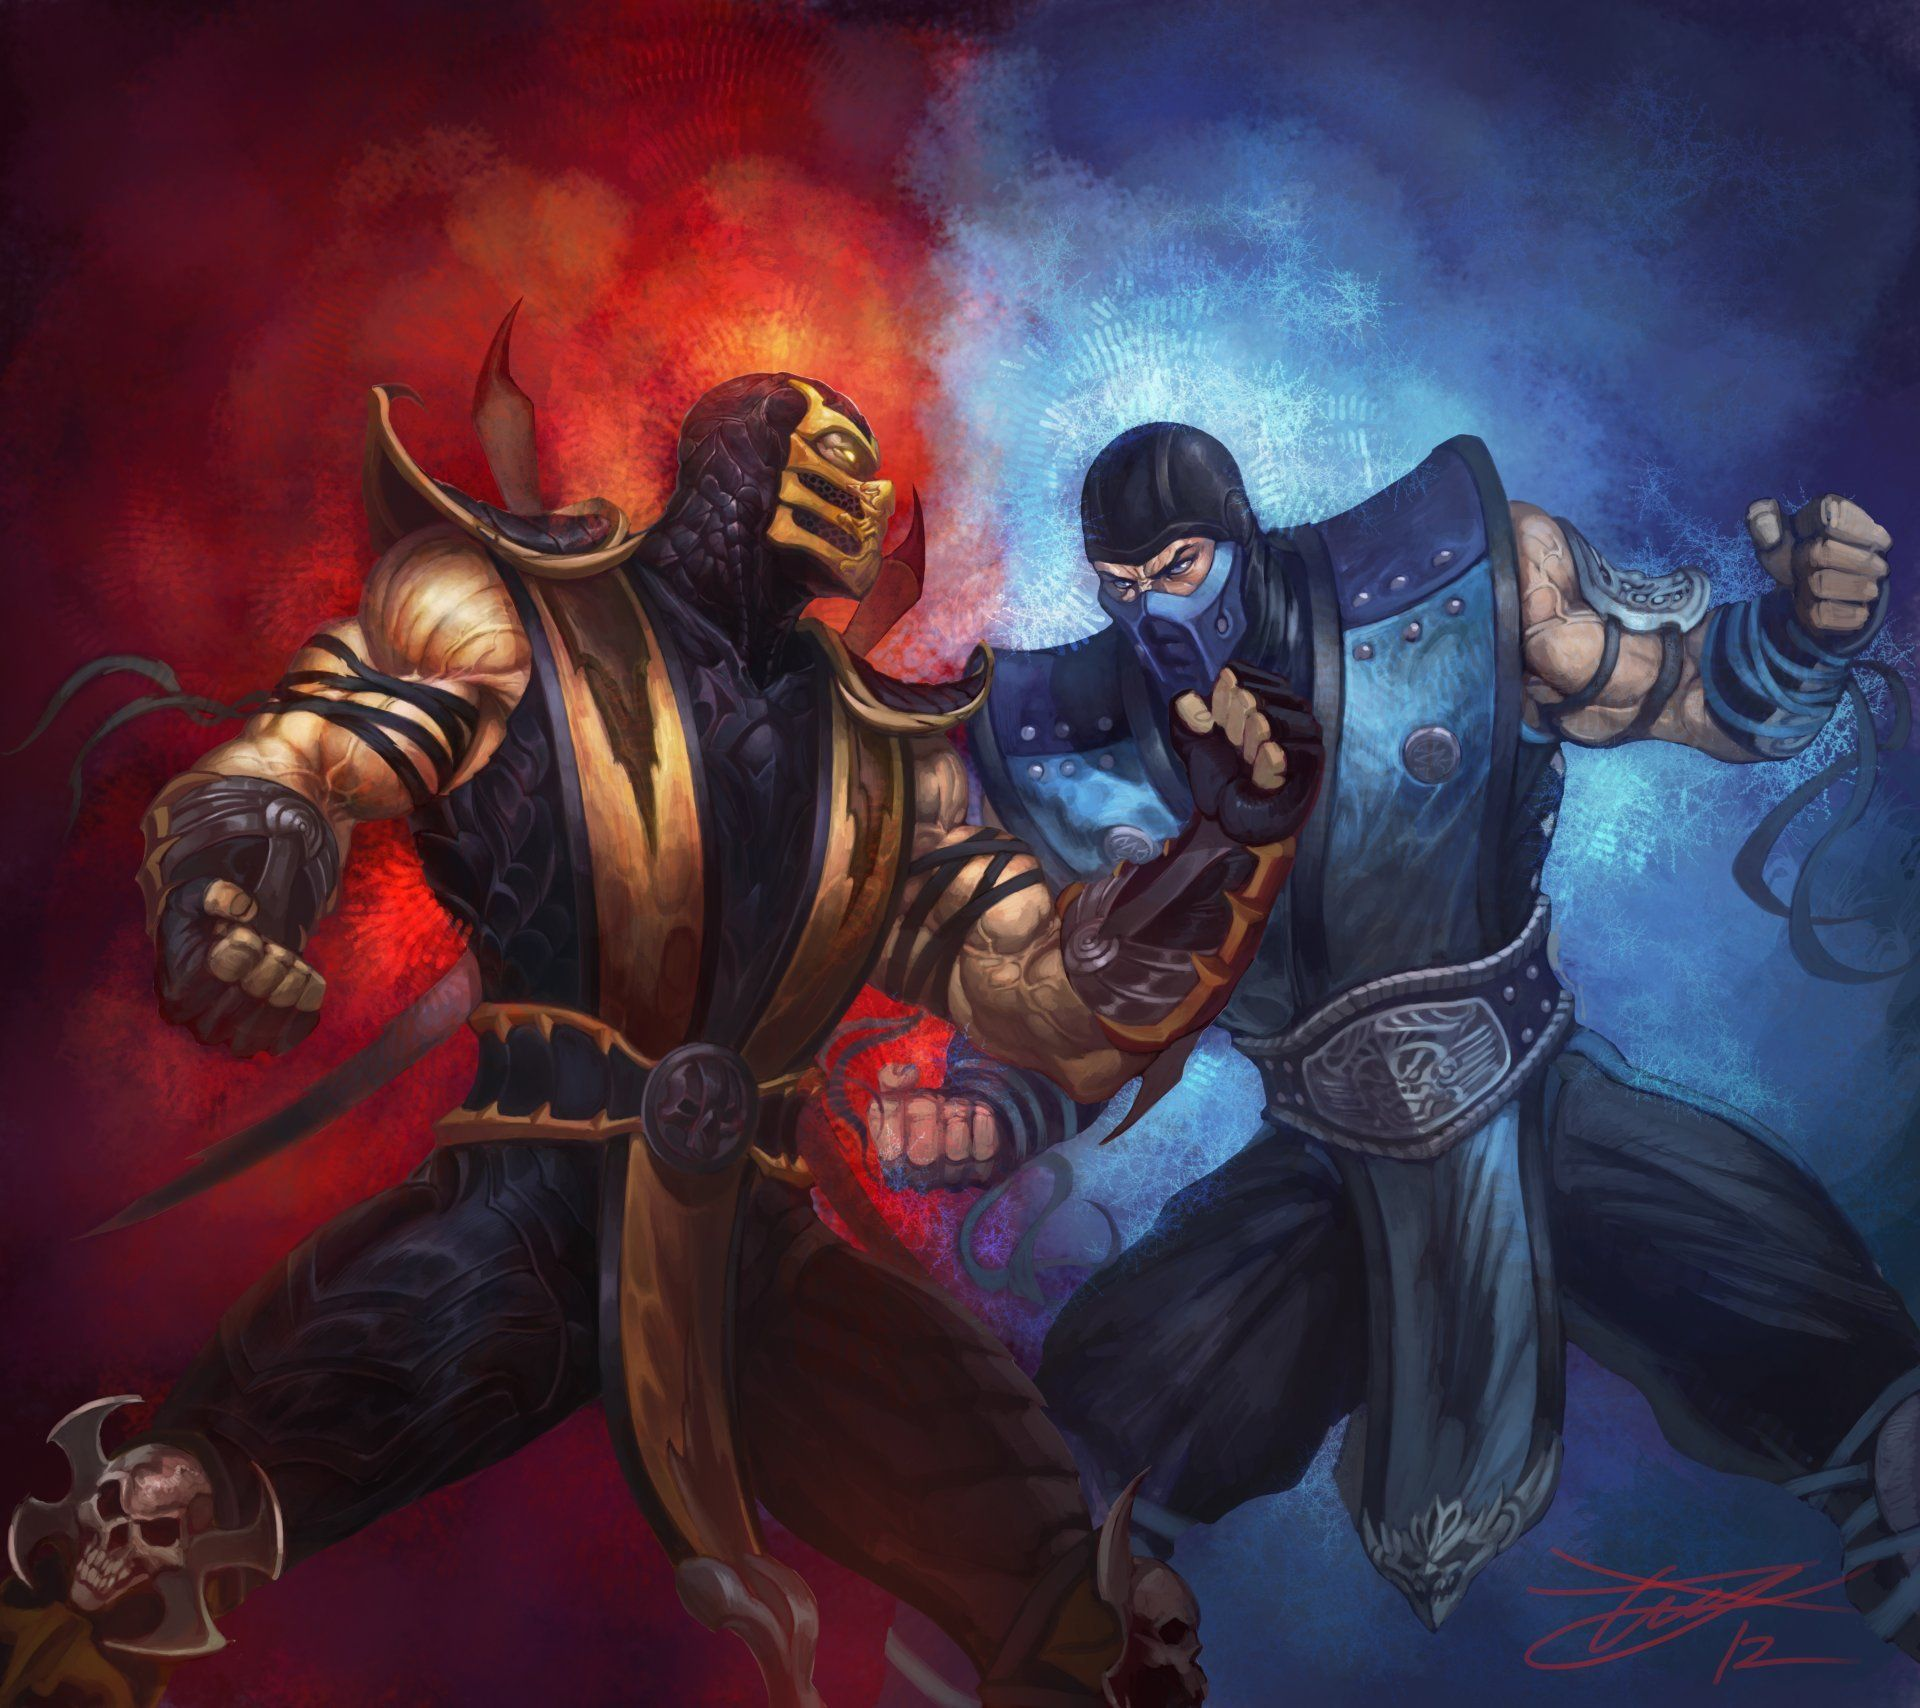 Fire Ninja Wallpapers - Top Free Fire Ninja Backgrounds ...